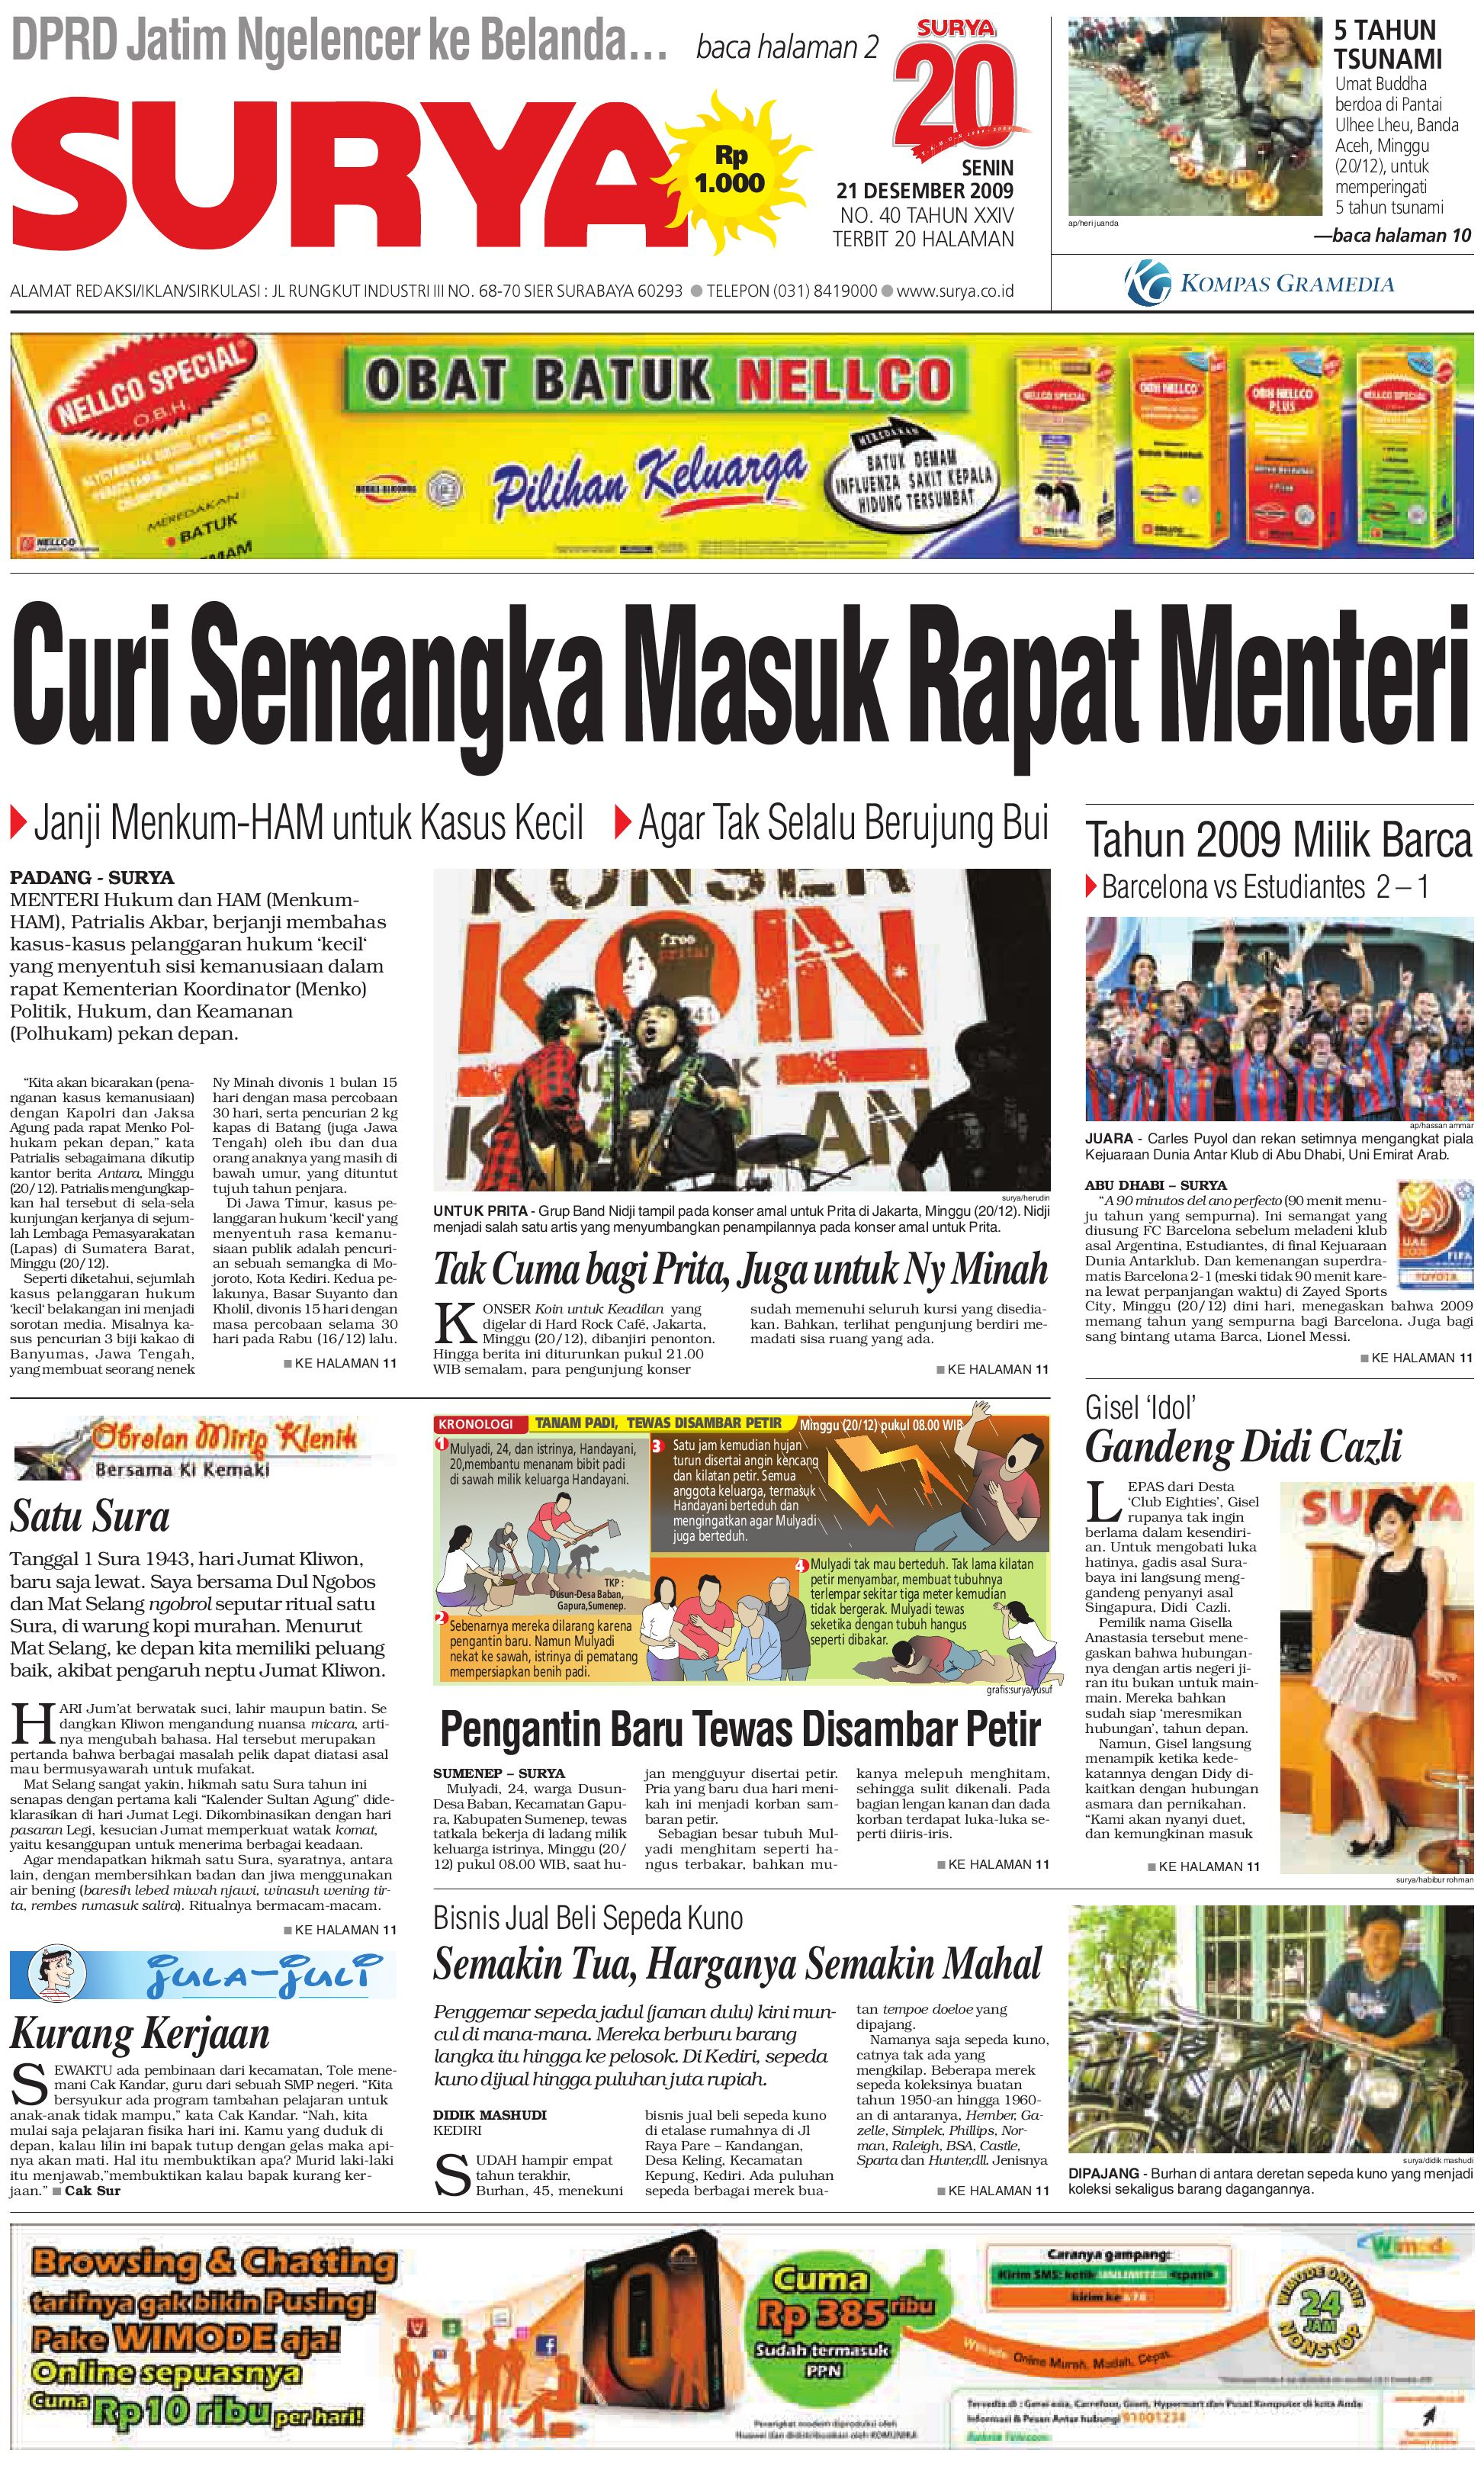 Surya Edisi Cetak 21 Des 2009 By Harian SURYA Issuu